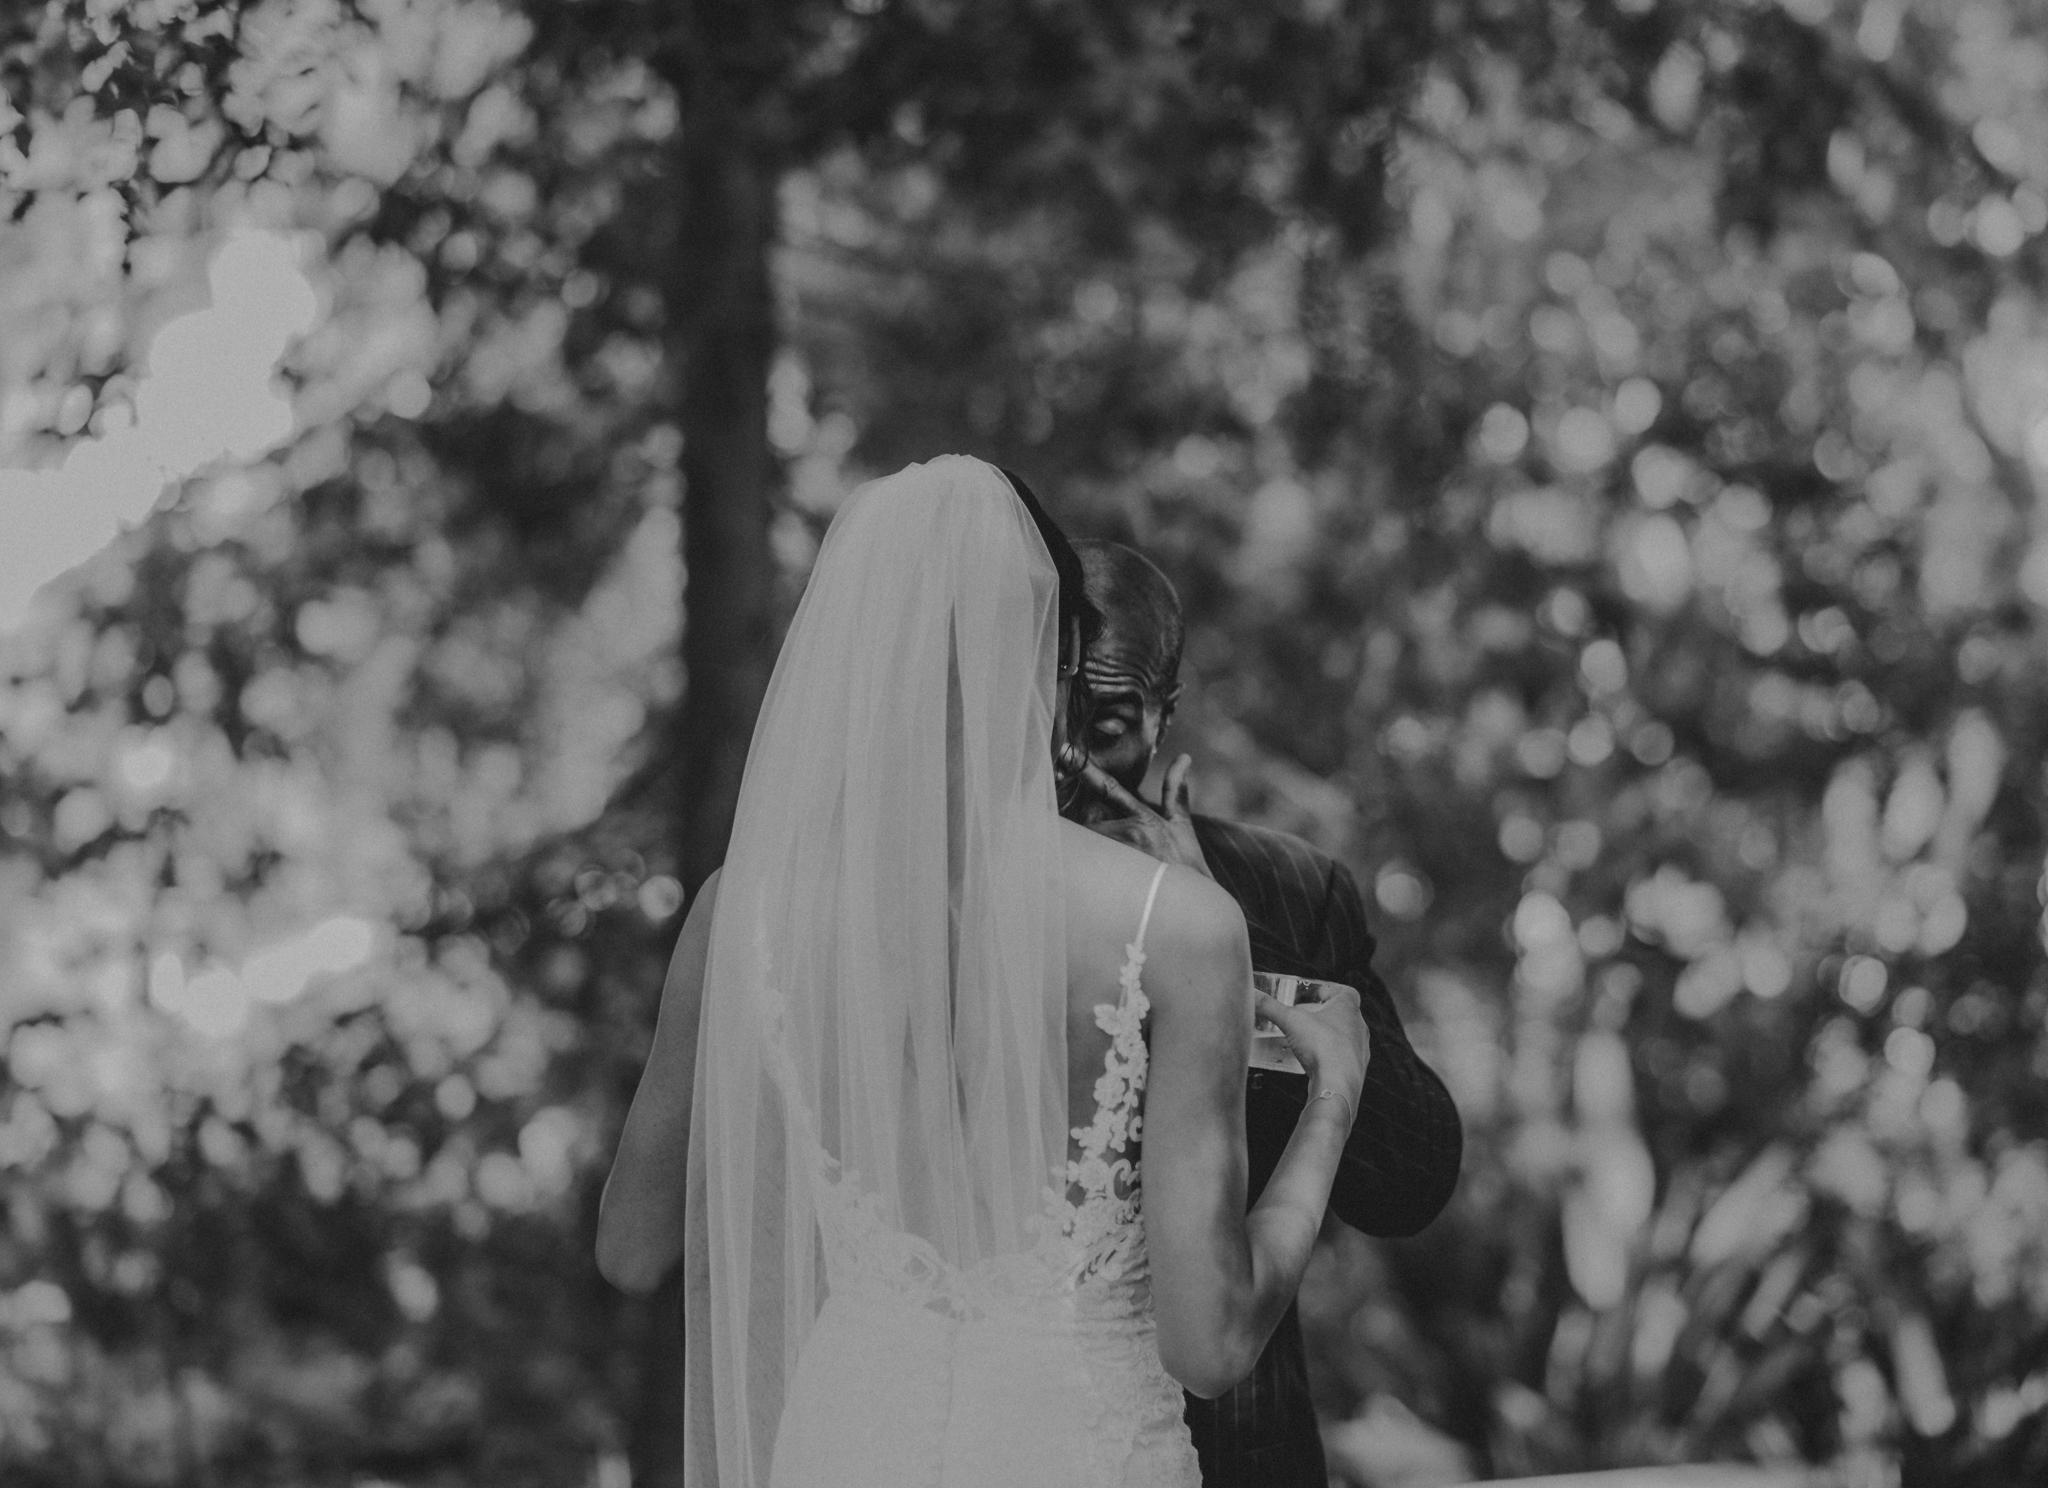 Isaiah + Taylor Photography - Rancho Las Lomas Wedding, Los Angeles Wedding Photographer-073.jpg